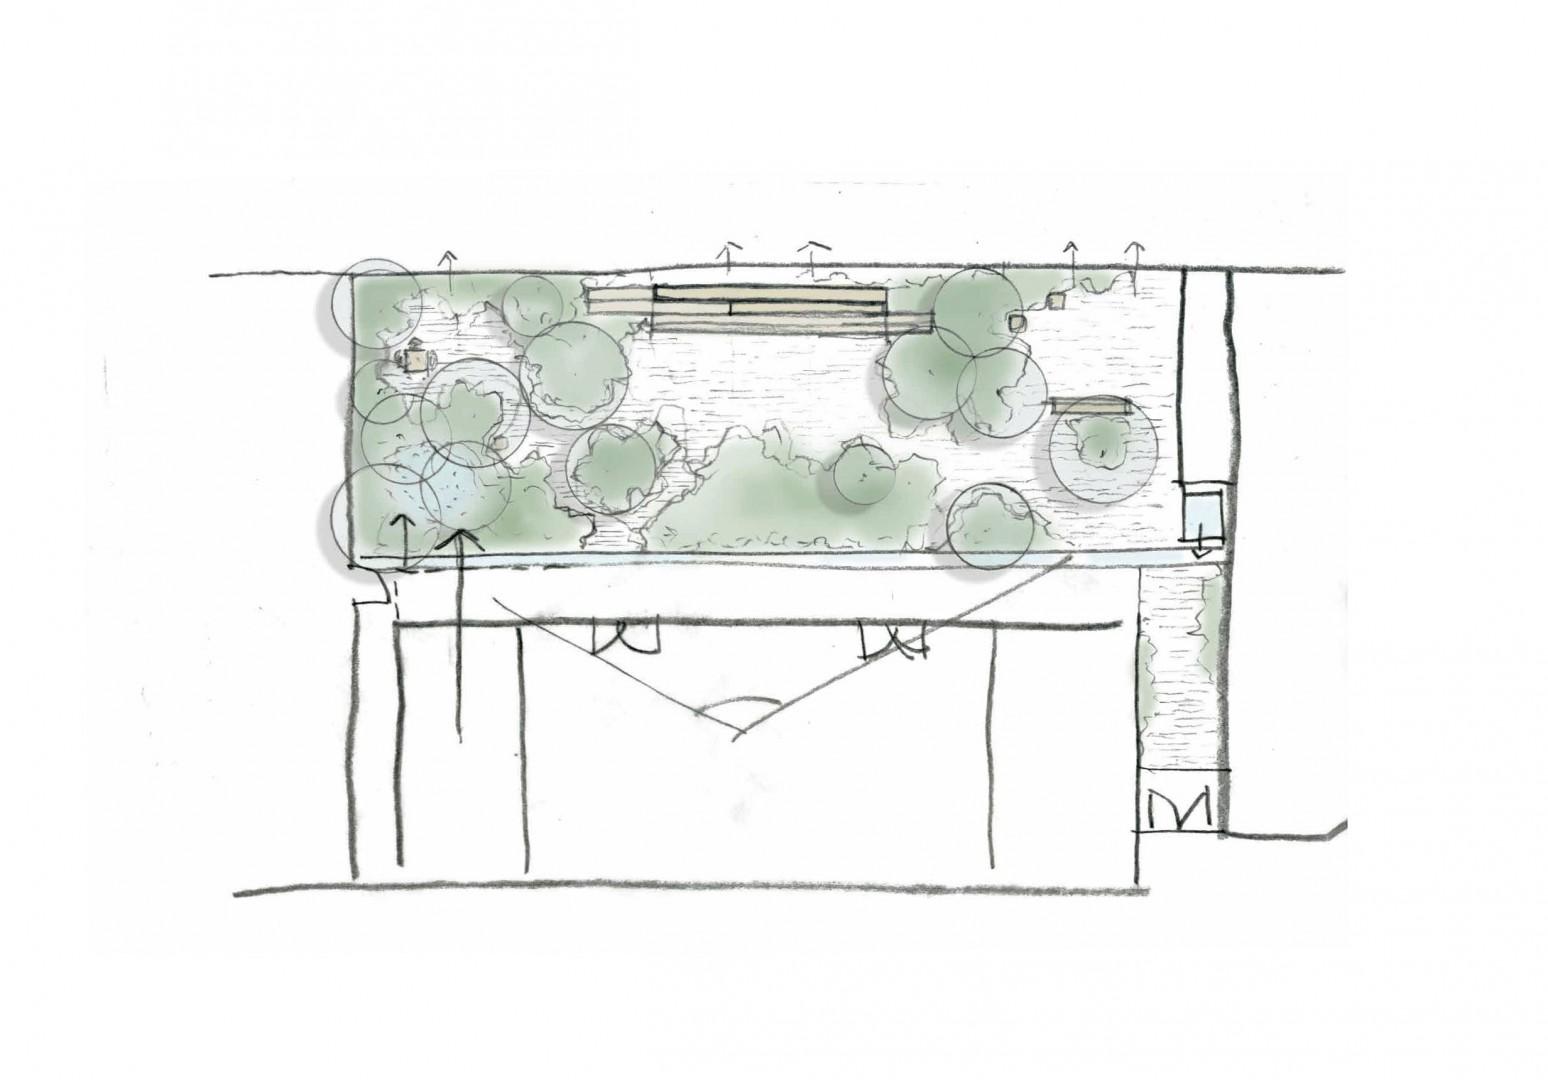 160728 Oasis  amp  FF Garden Sketch Design Page 06